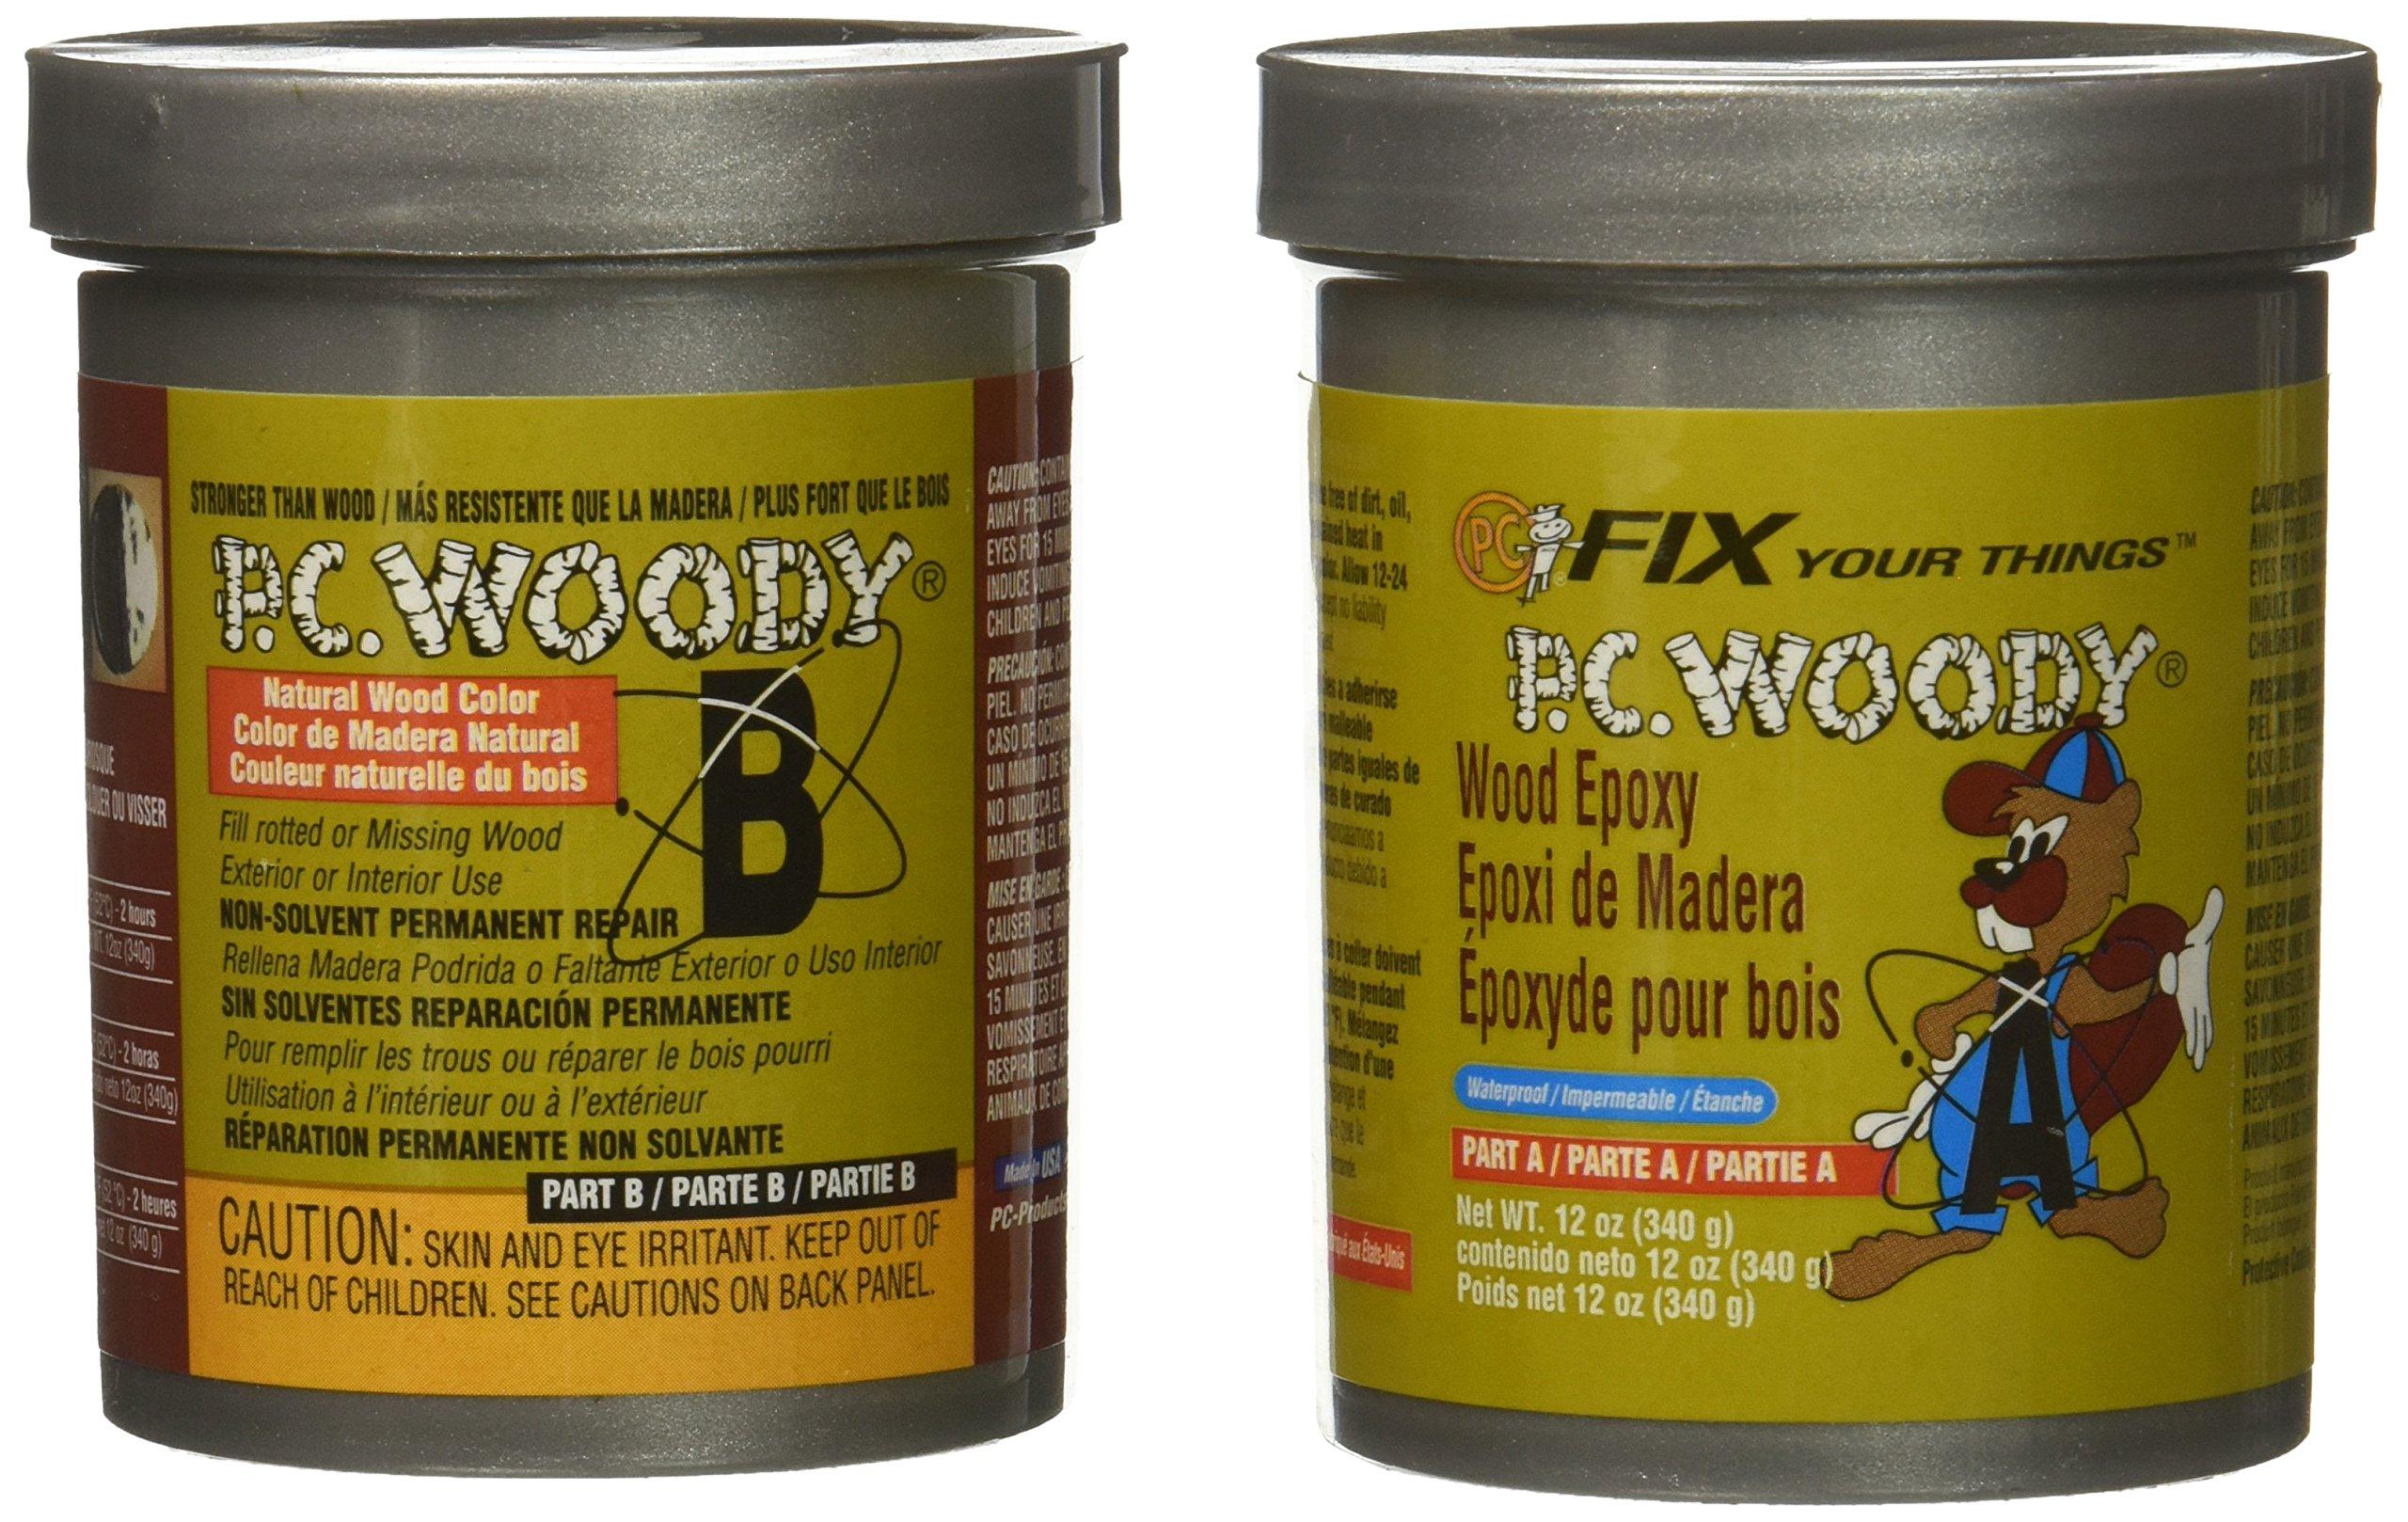 Protective Coatings 18434 12 oz. PC-Woody Epoxy Paste by Protective Coatings (Image #1)